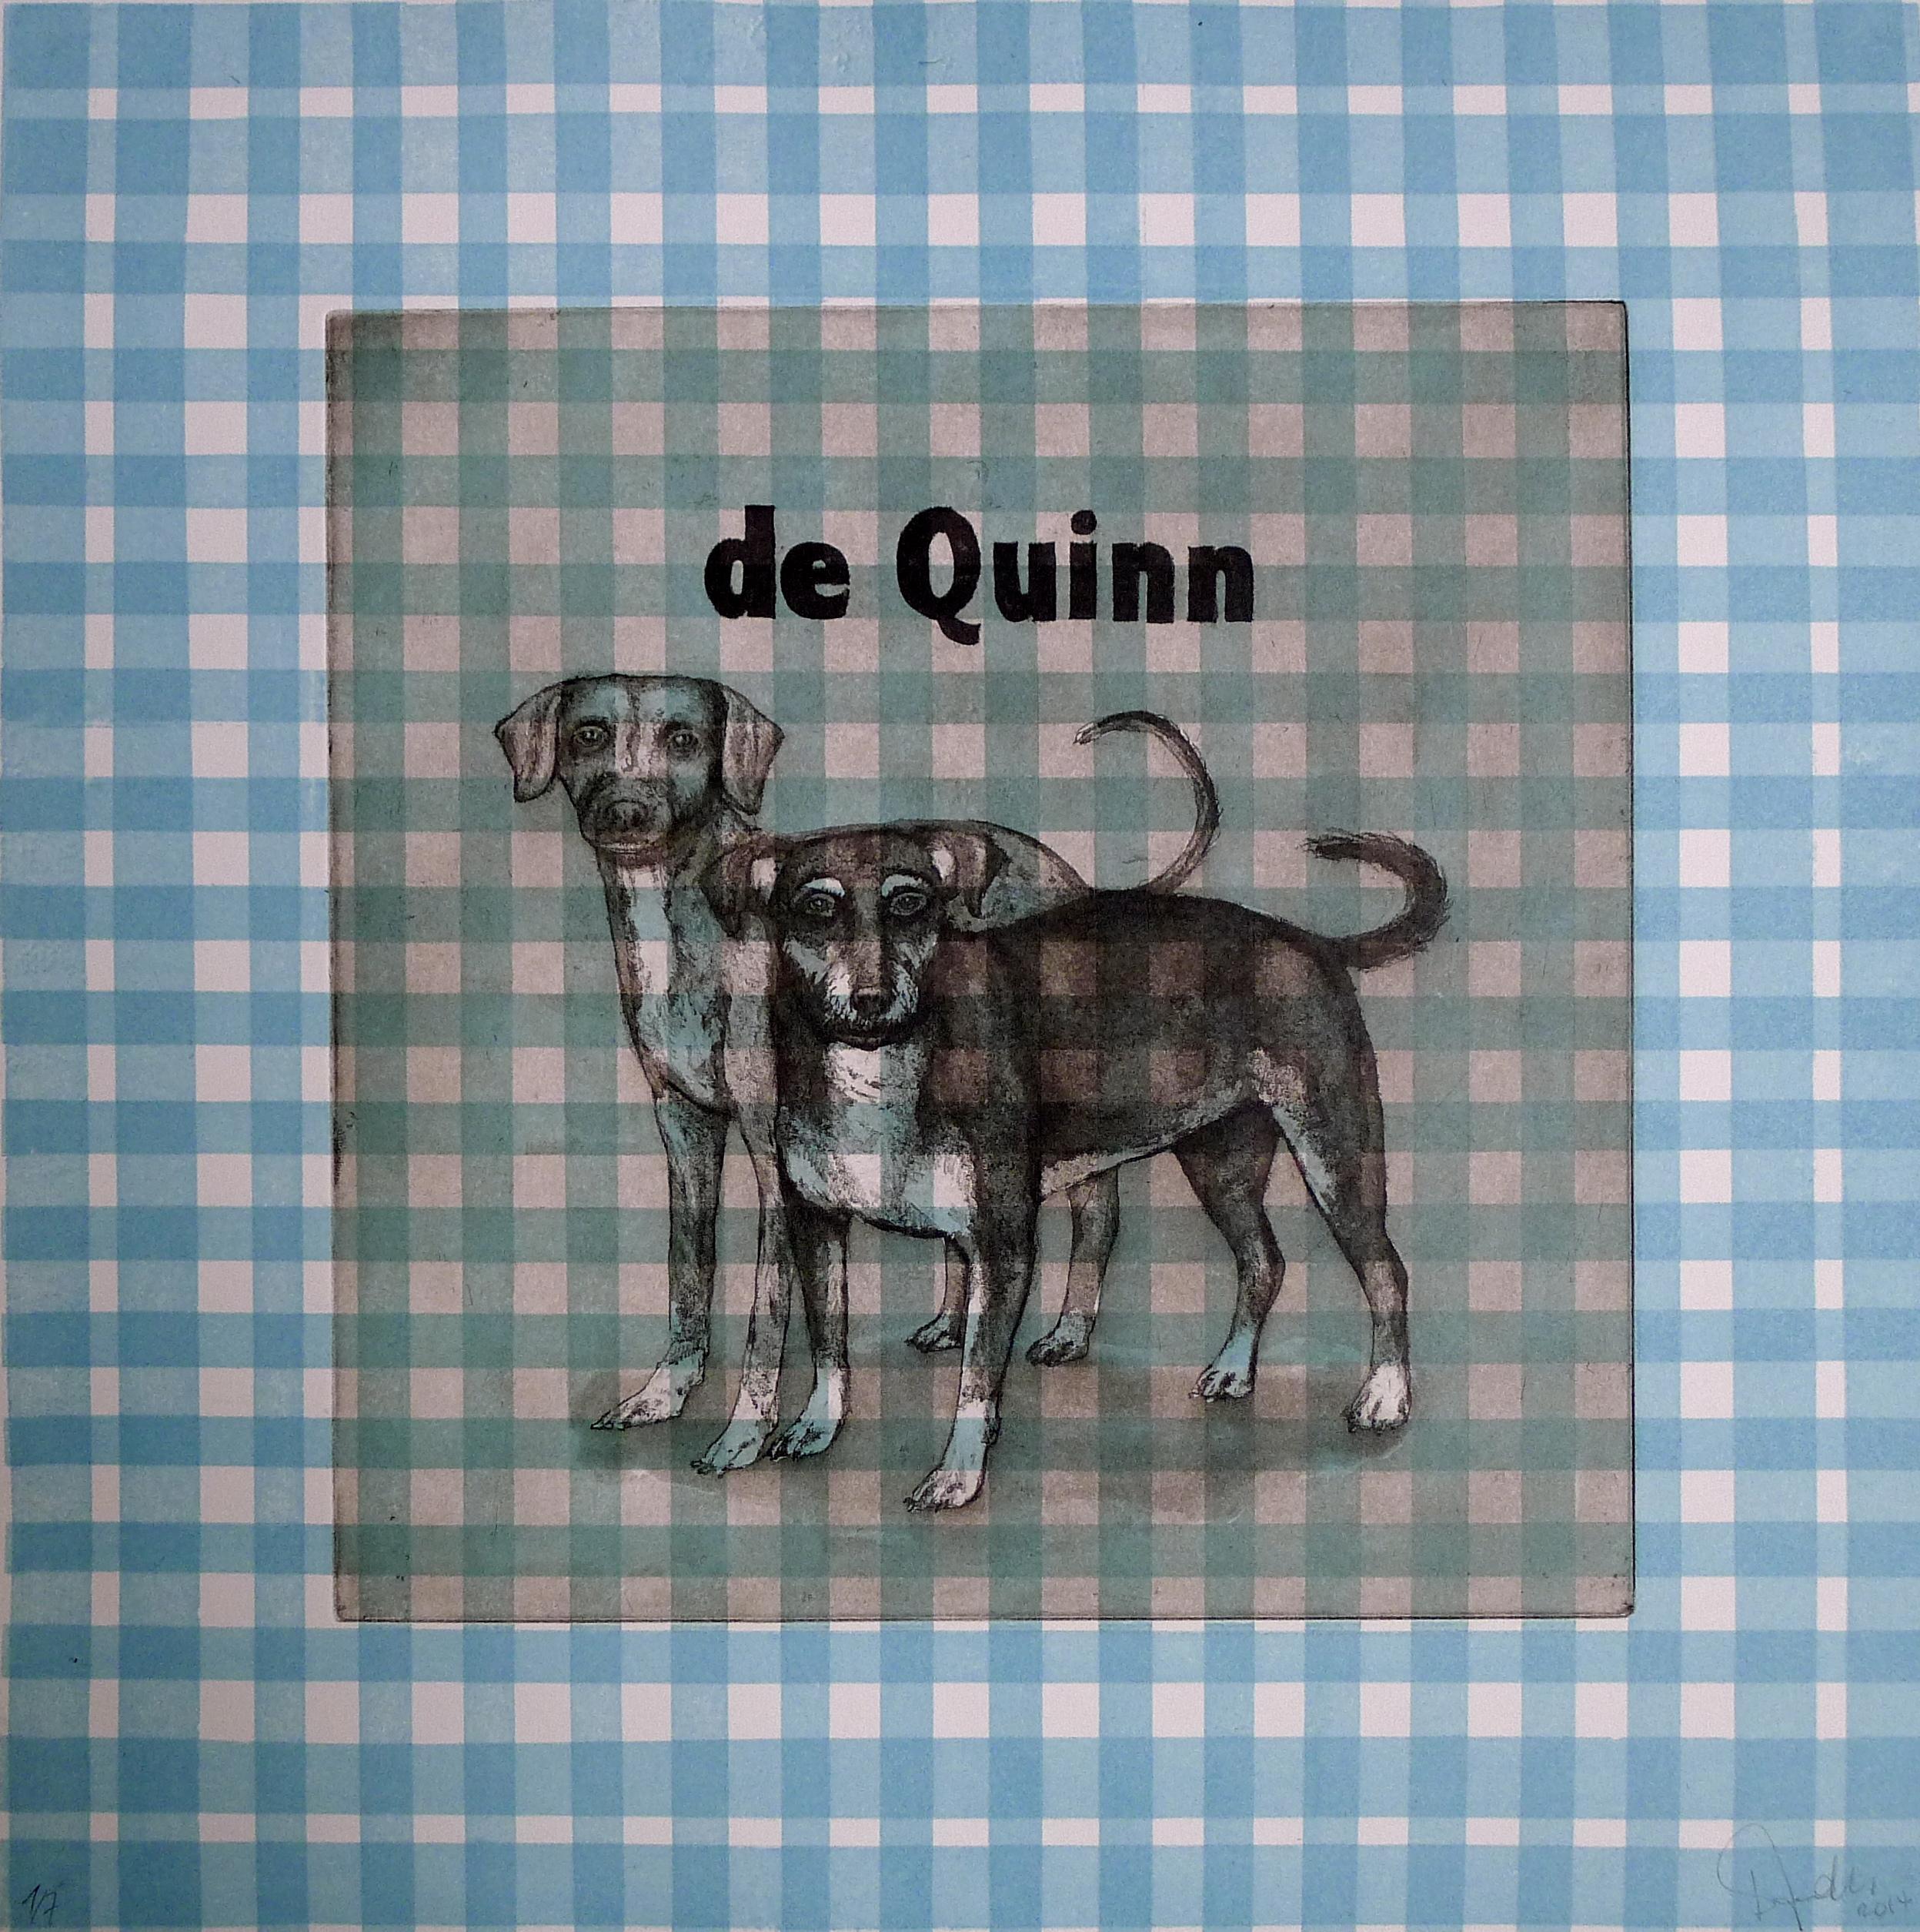 de Quinn